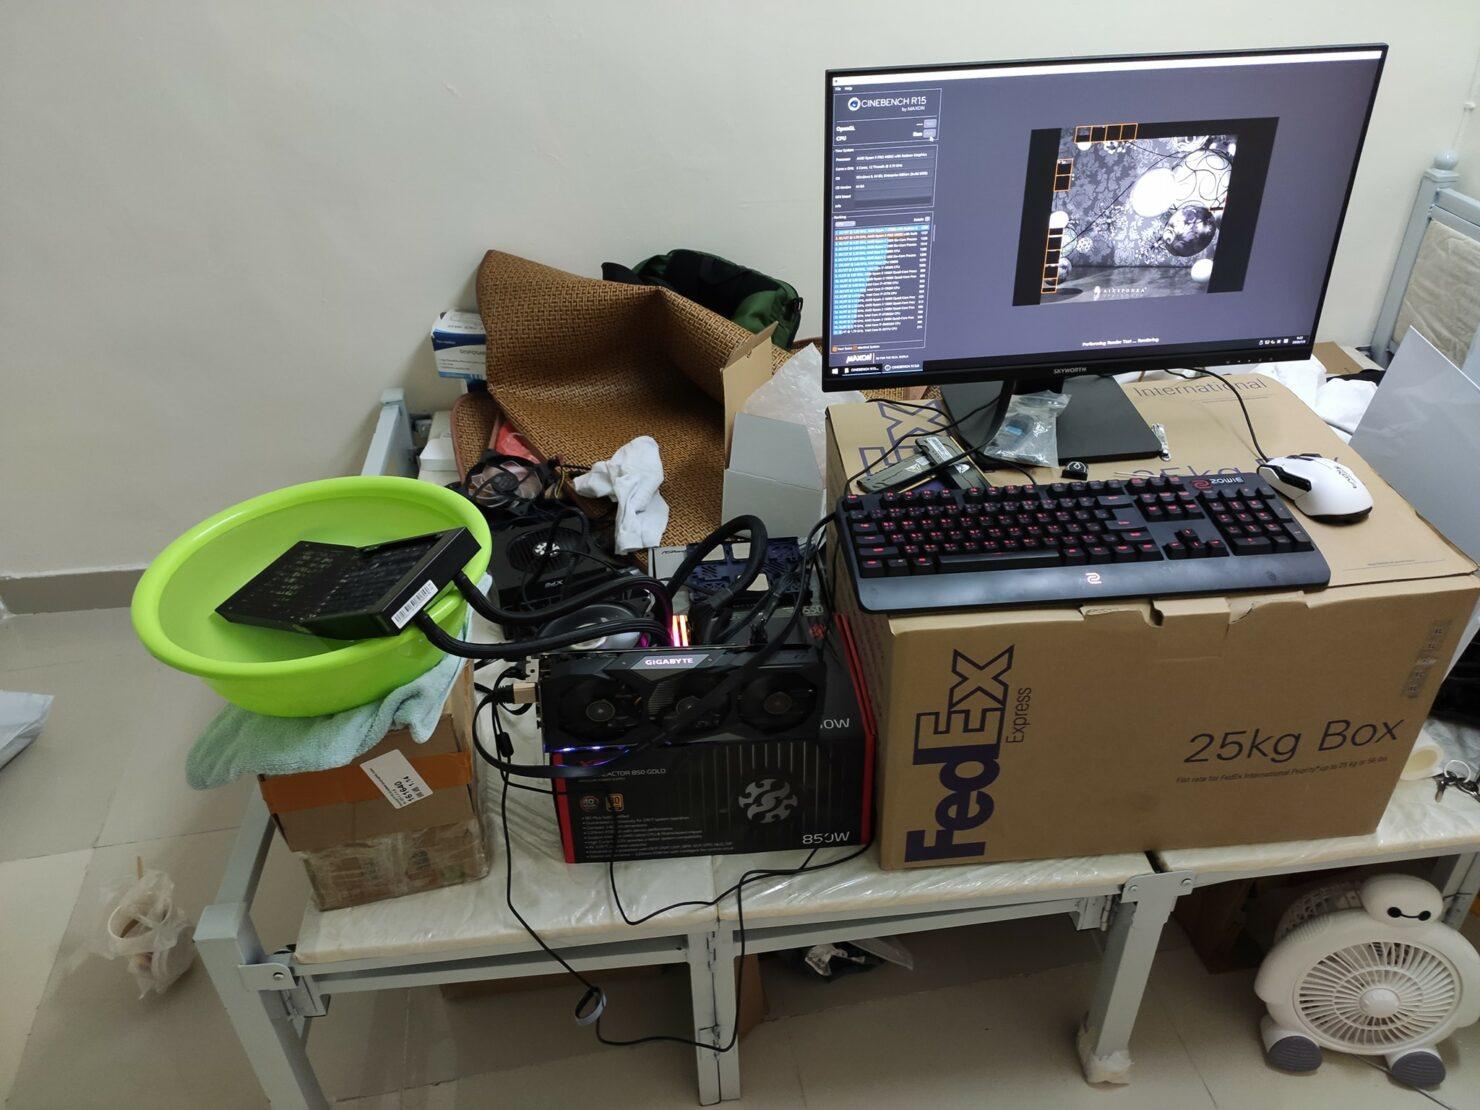 amd-ryzen-7-4700g-renoir-8-core-apu_4-55-ghz-overclock_benchmarks_4